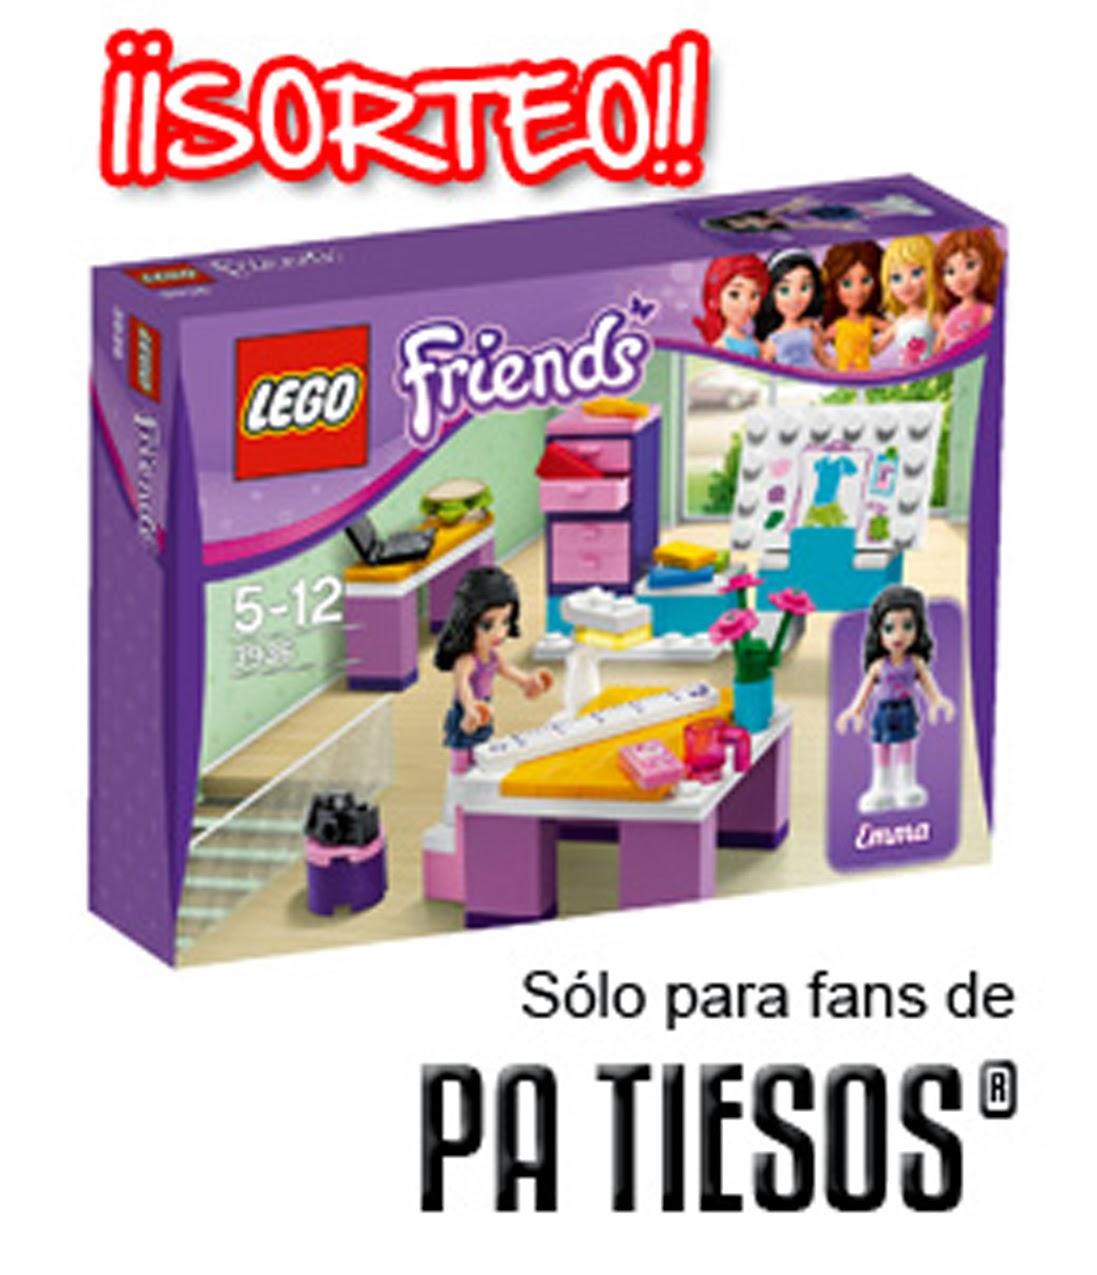 http://www.patiesos.es/2014/01/sorteo-set-de-lego-el-taller-de-moda-de.html